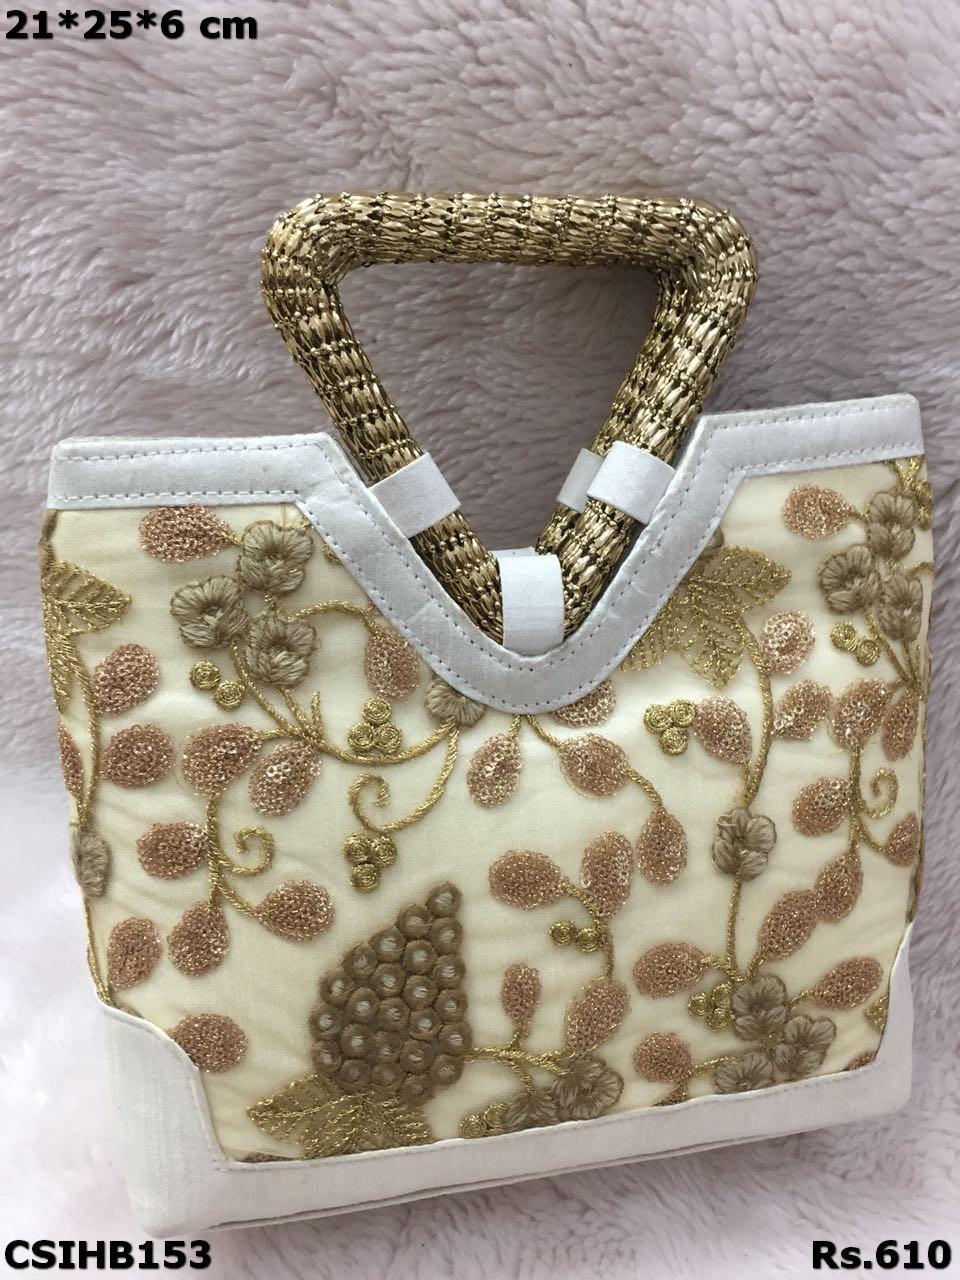 Triangle handle handbag